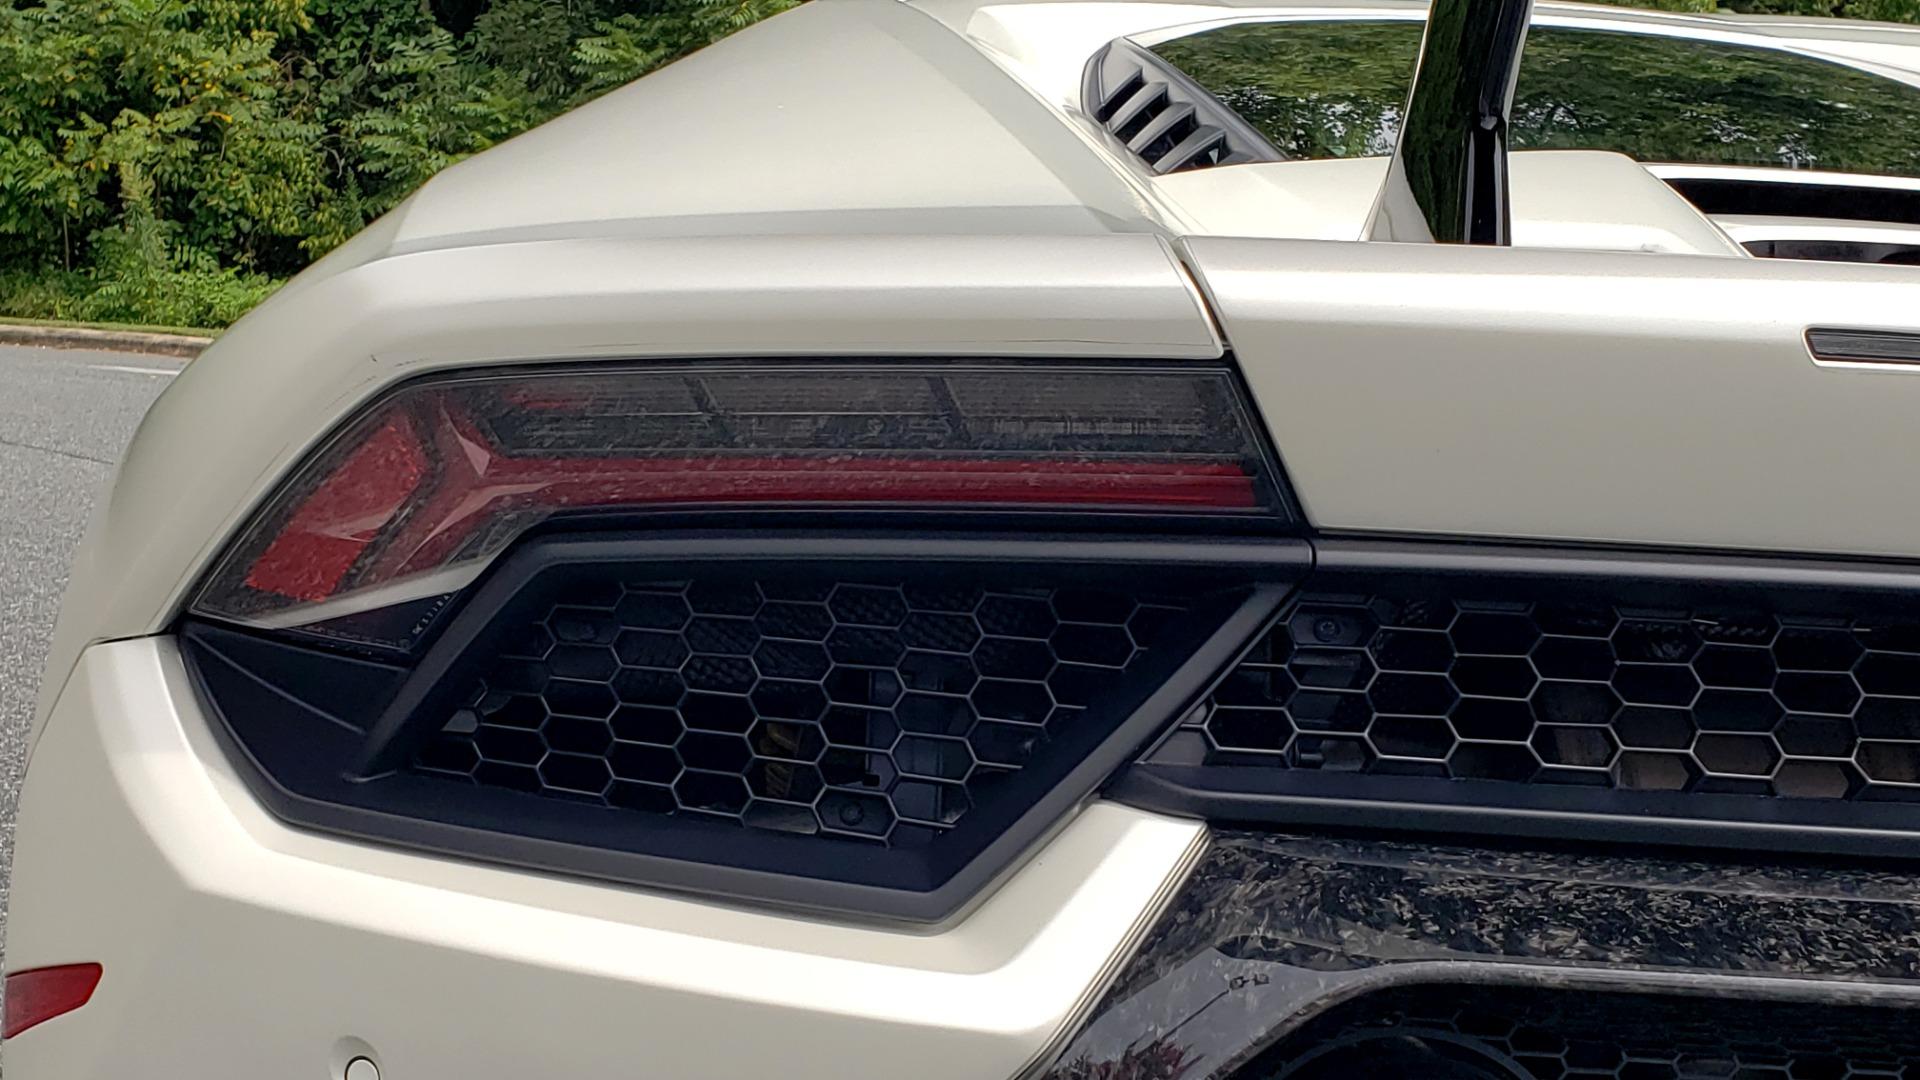 Used 2018 Lamborghini HURACAN PERFORMANTE 5.2L V10 / 630HP / 7-SPD AUTO / AWD / NAV / PREM SND for sale $269,995 at Formula Imports in Charlotte NC 28227 38